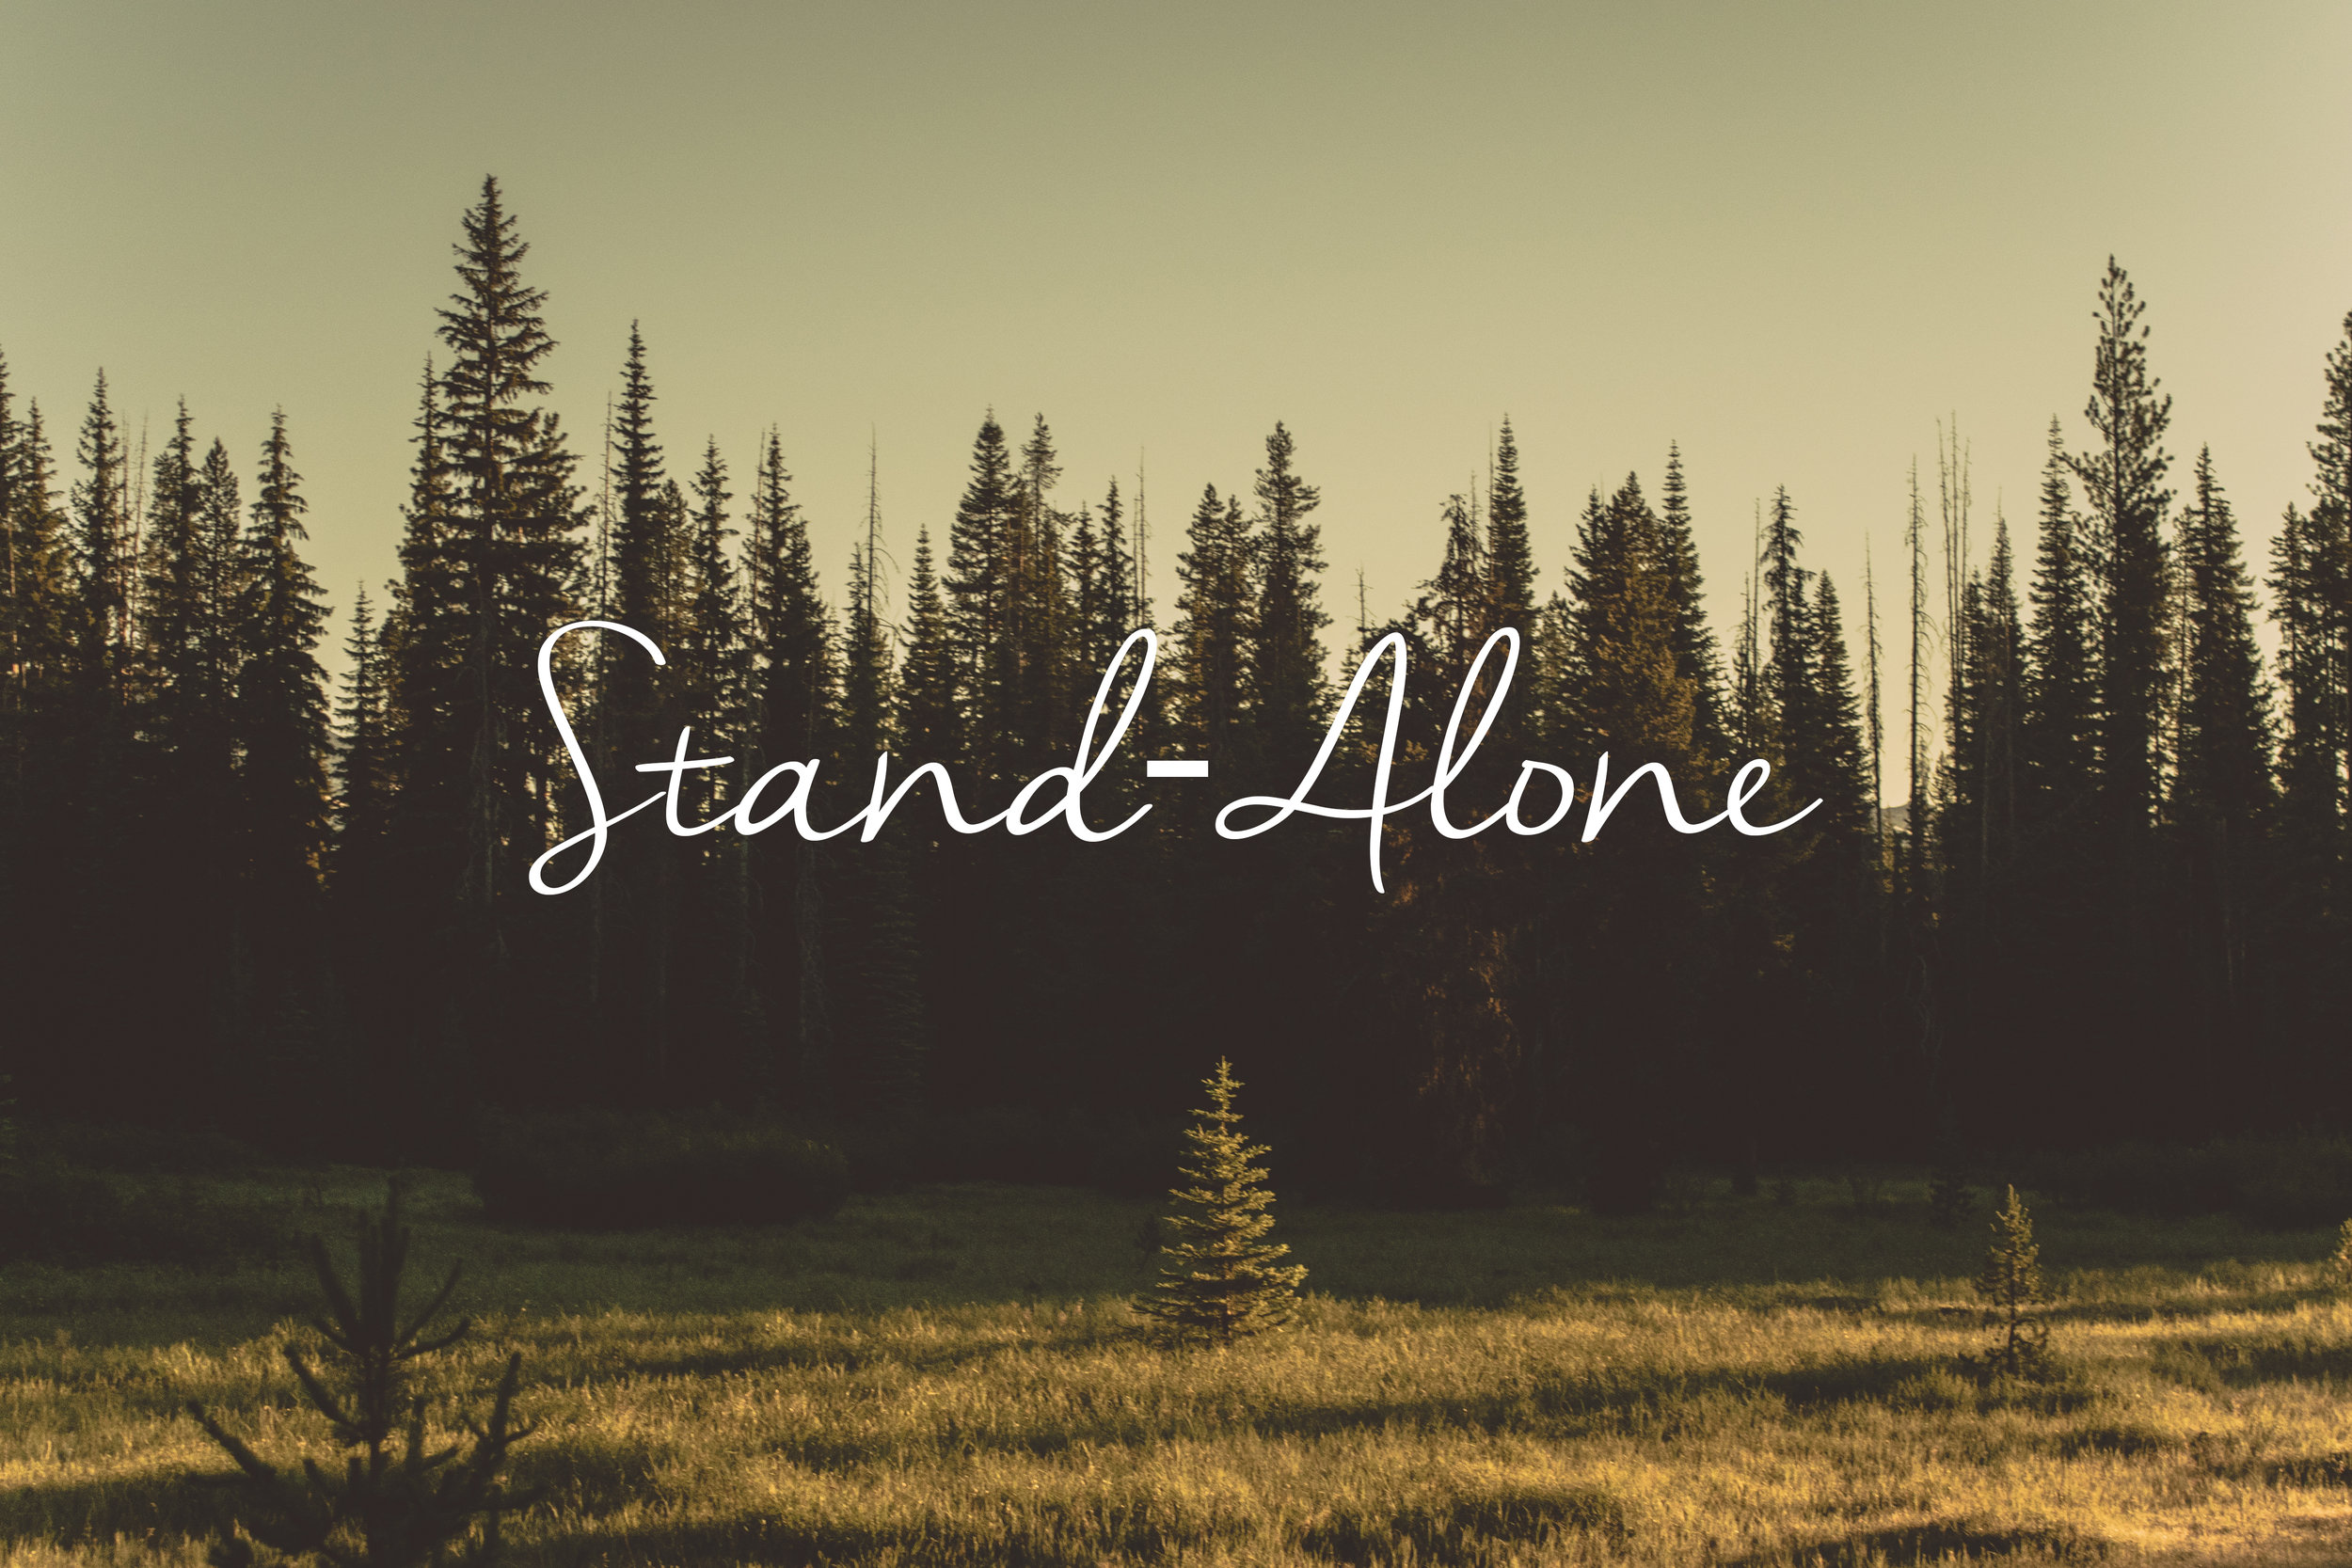 Stand-alone.jpg